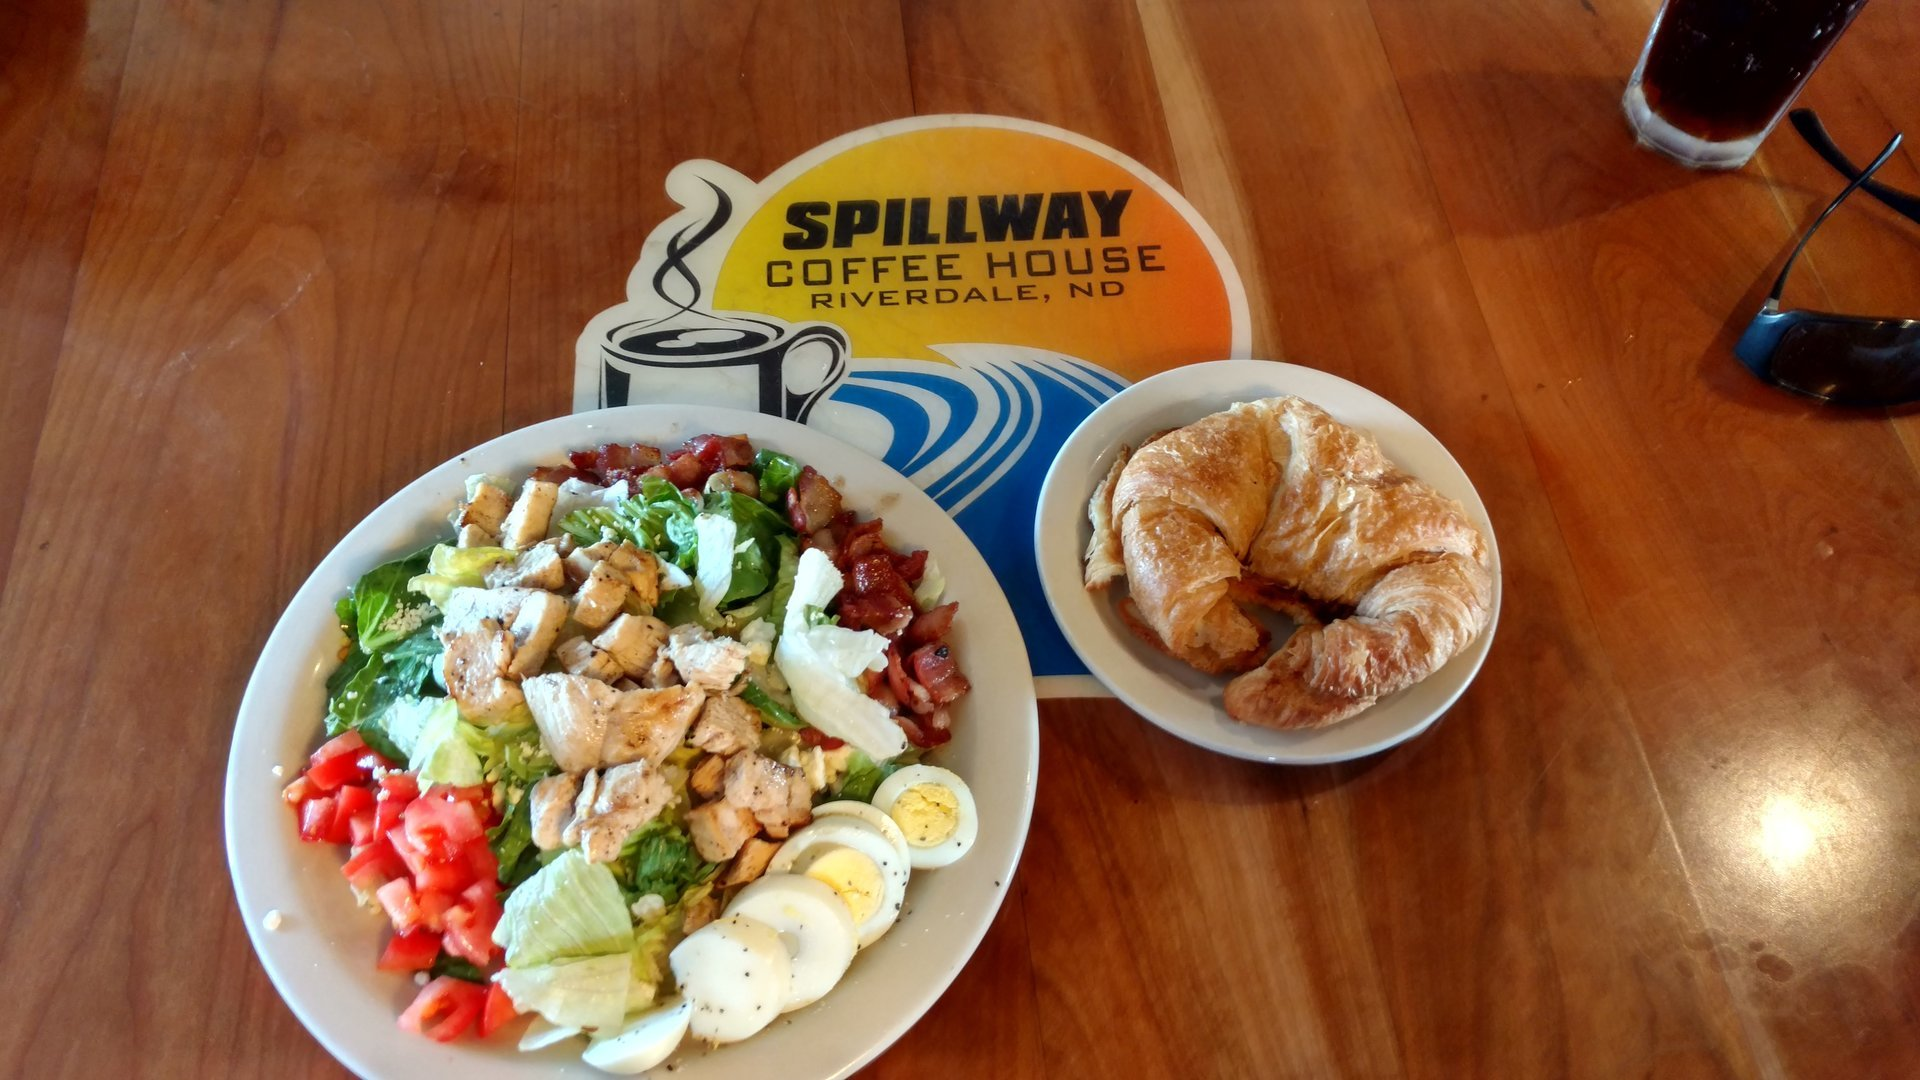 Spillway Coffee House LLC image 3